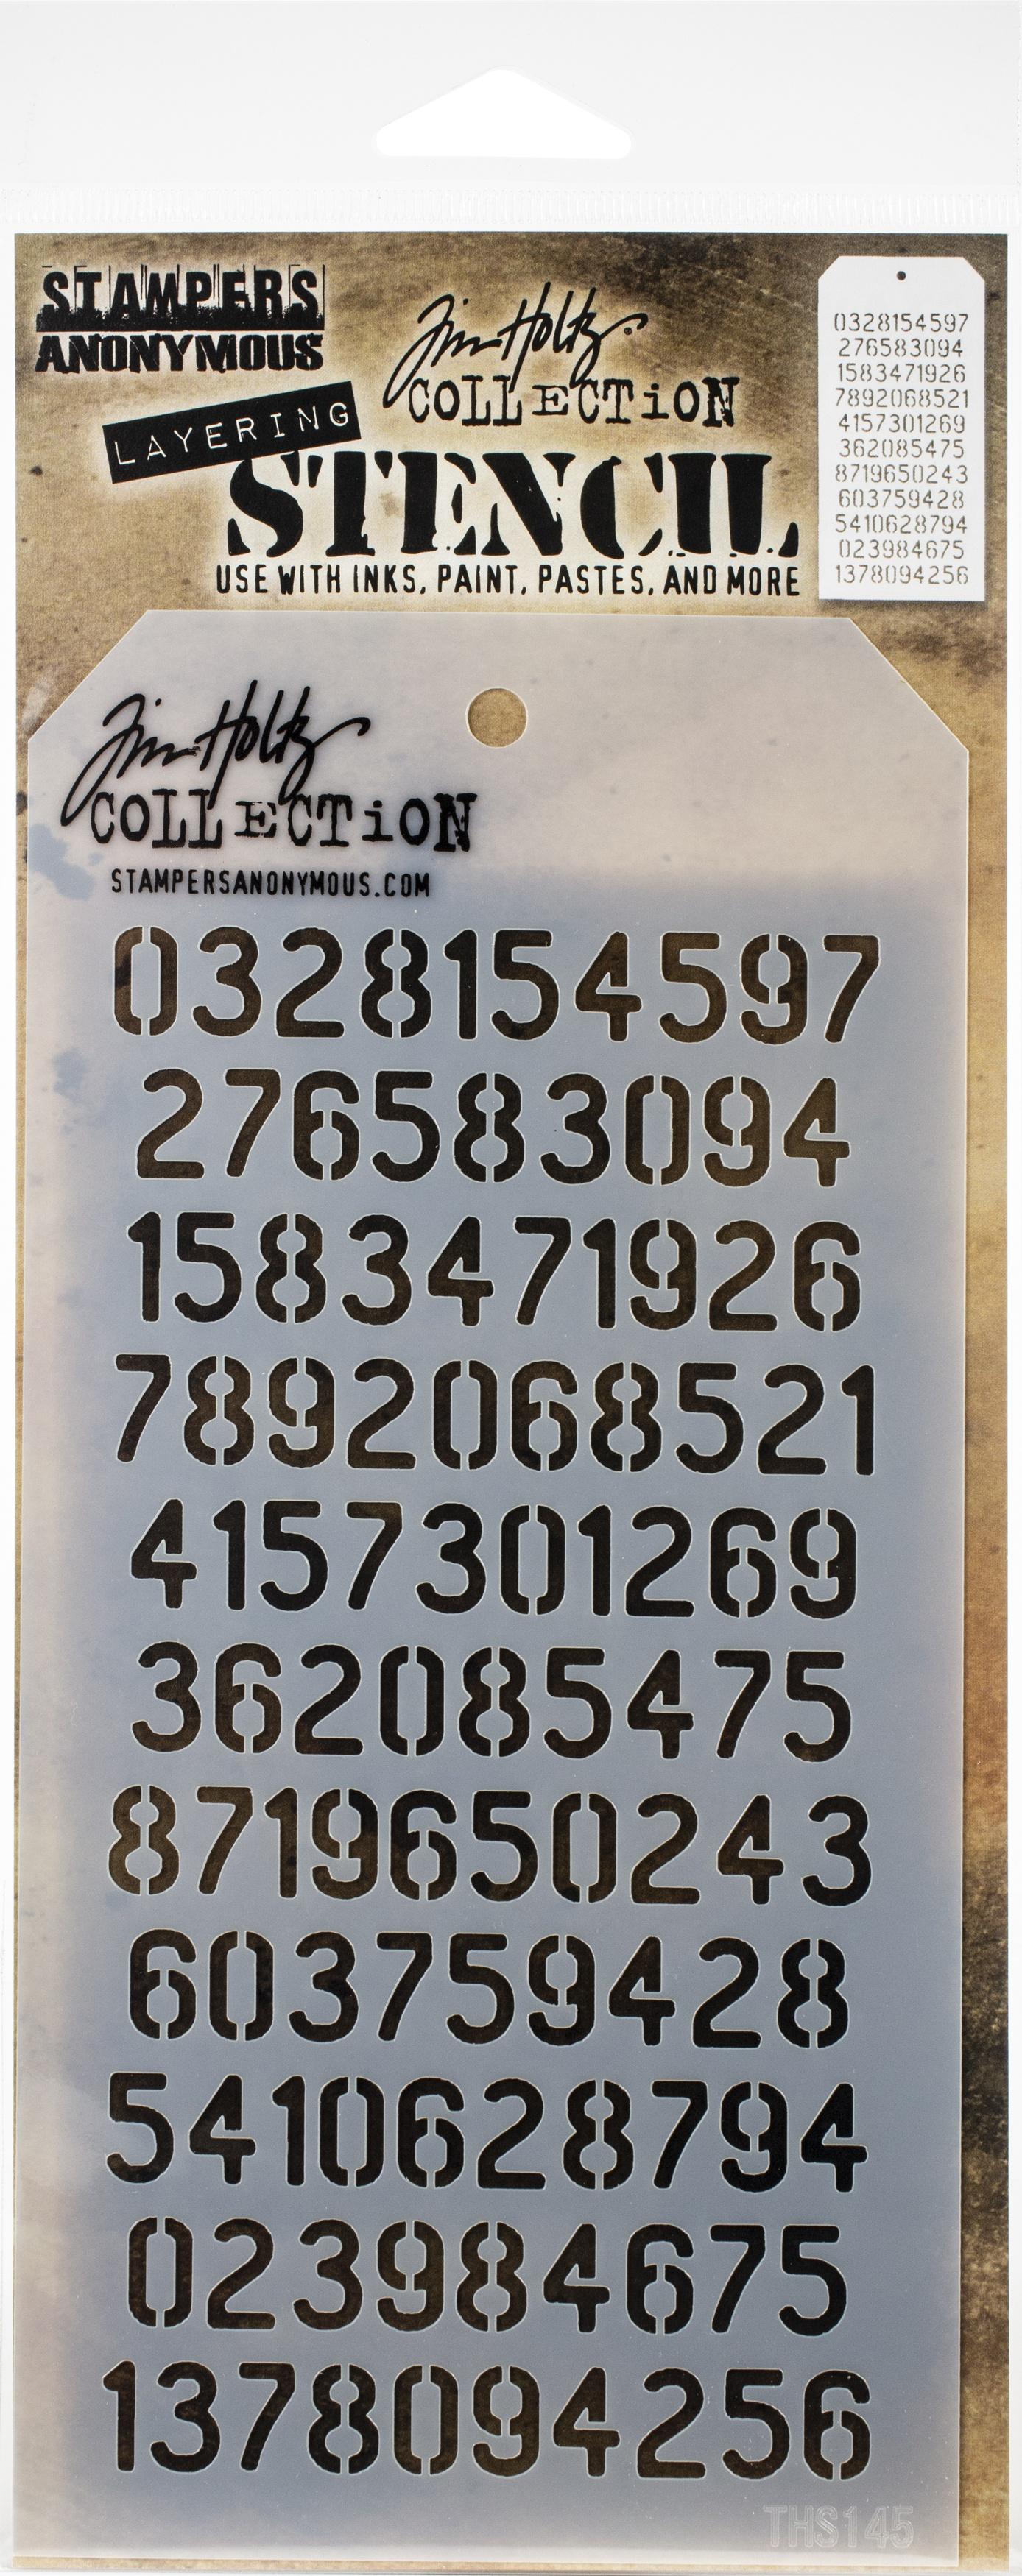 Tim Holtz Layered Stencil 4.125X8.5-Digits -Layered